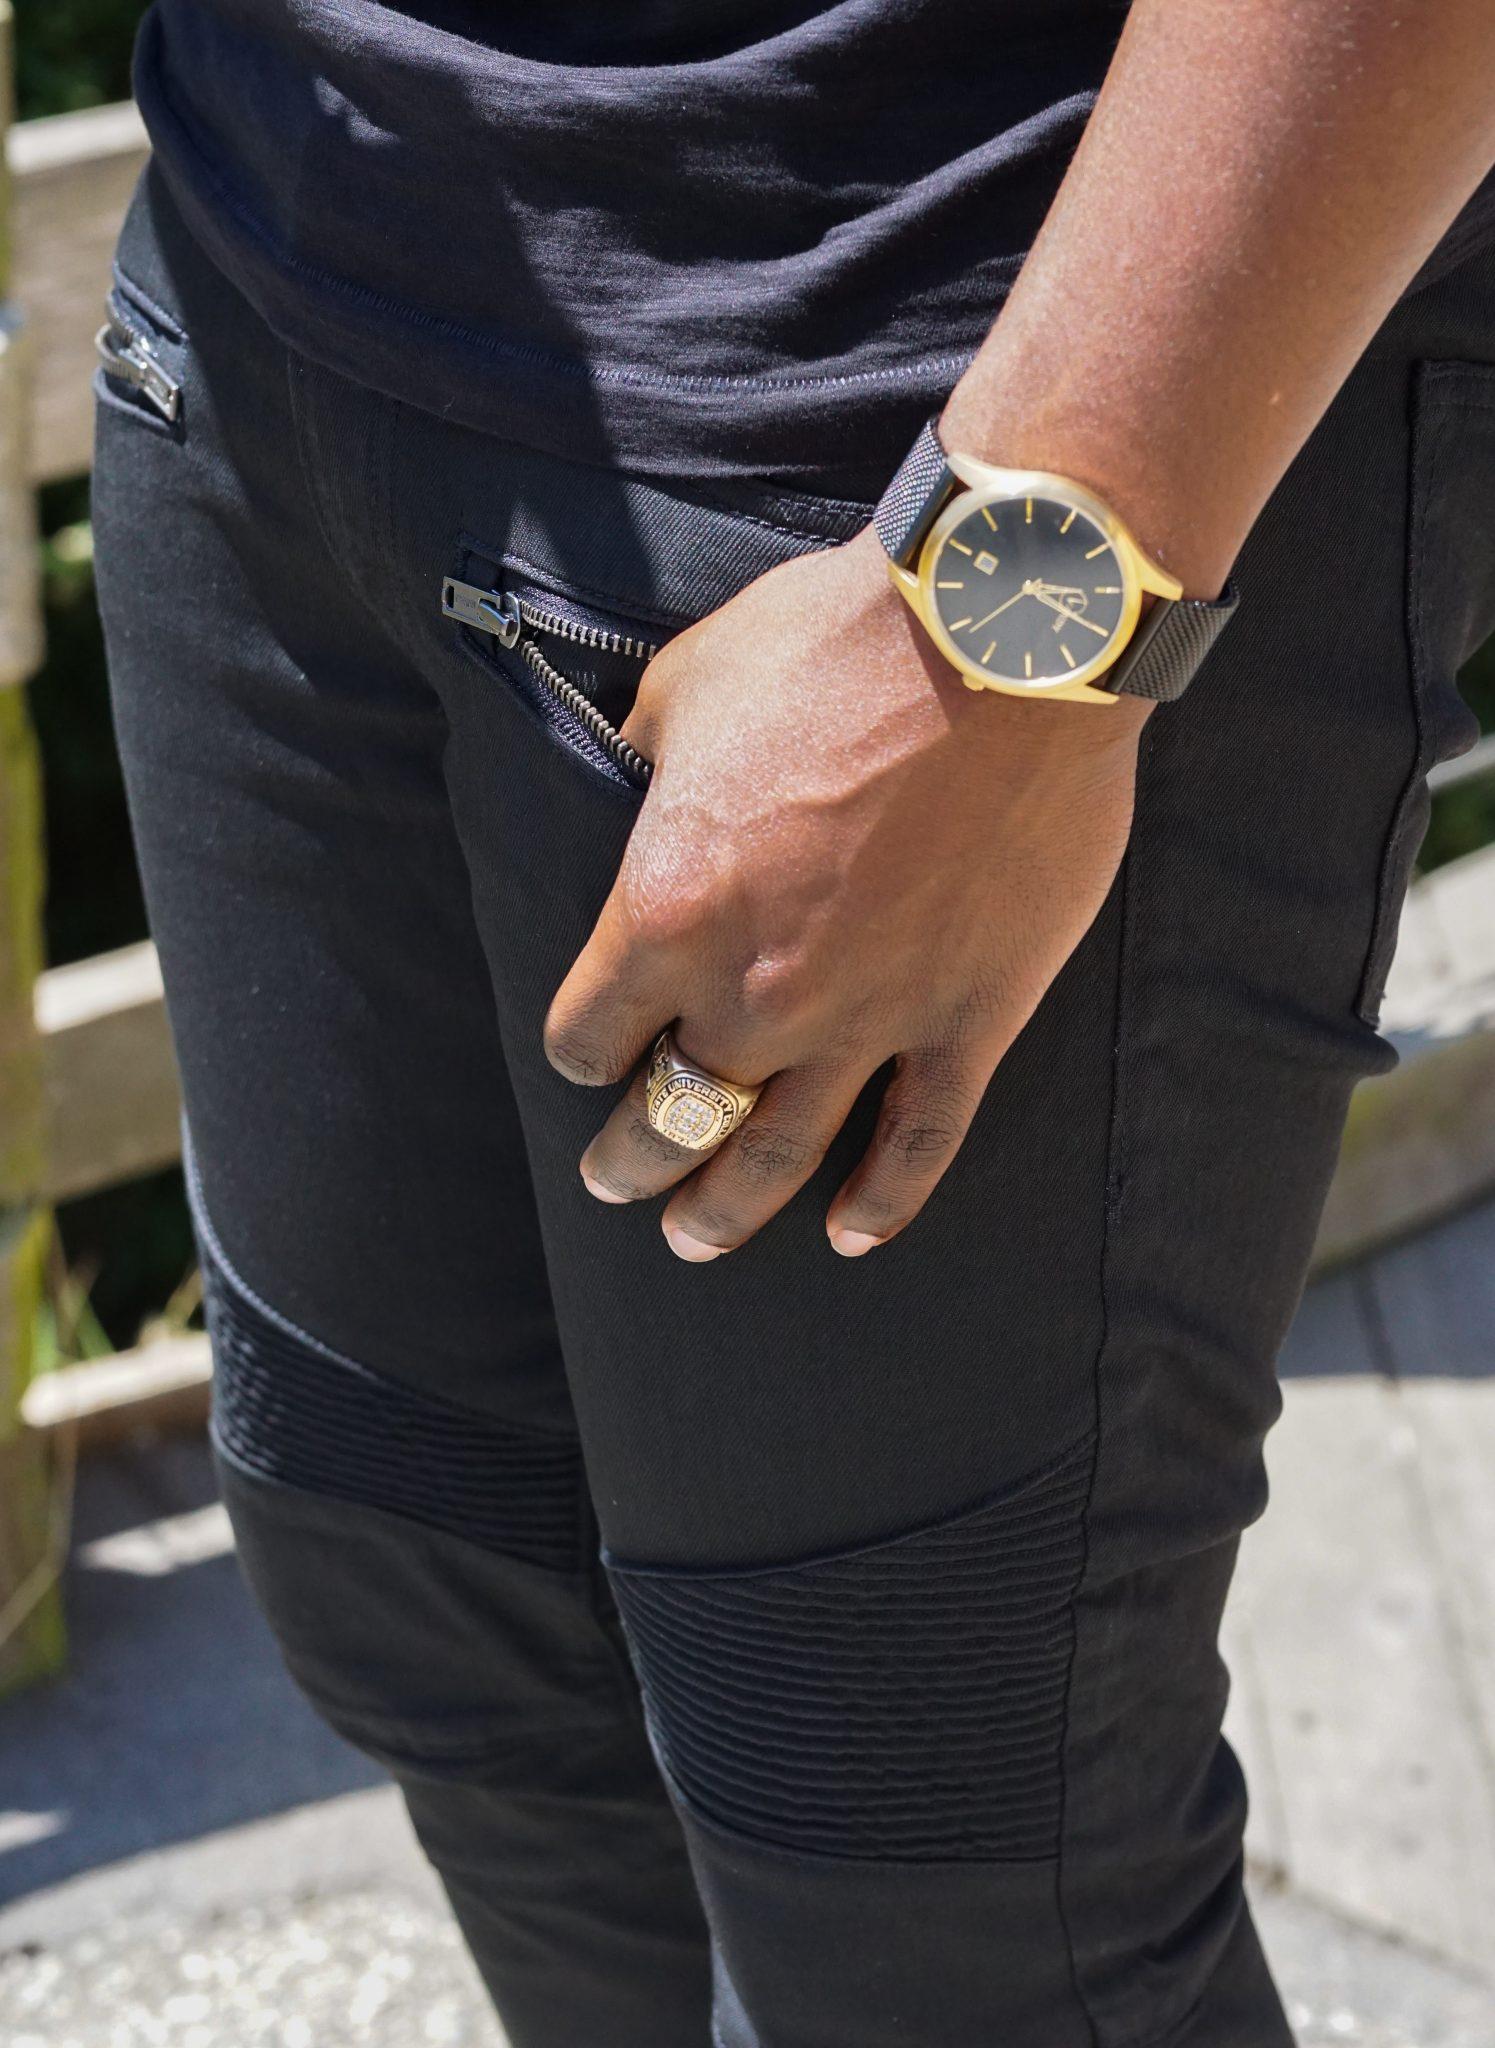 dapper advisor-express-black slim moto jeans-supersoft henley shirt